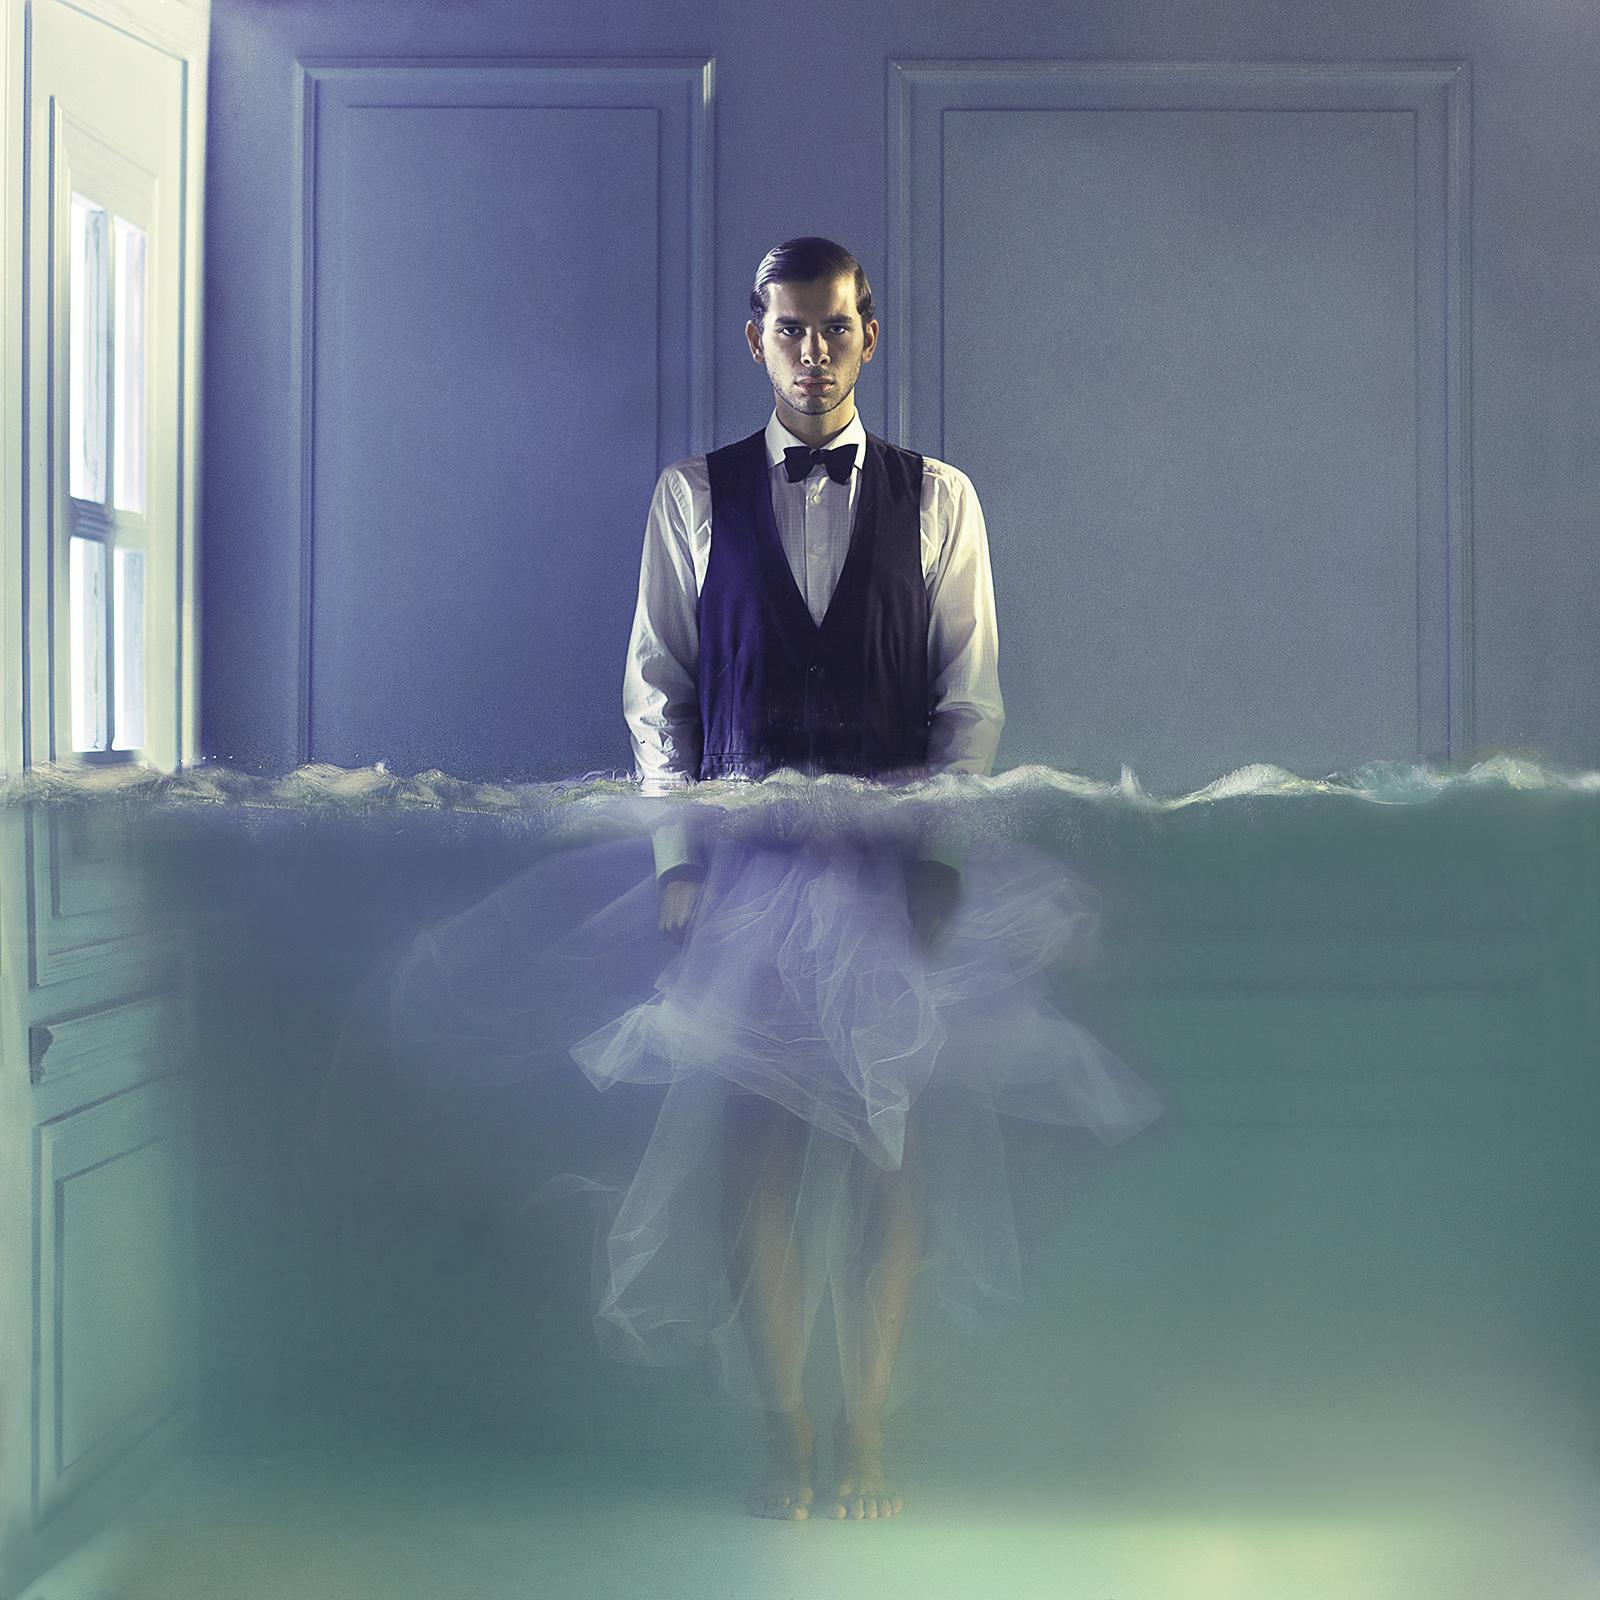 surrealismo-acuatico-lara-zankoul-04